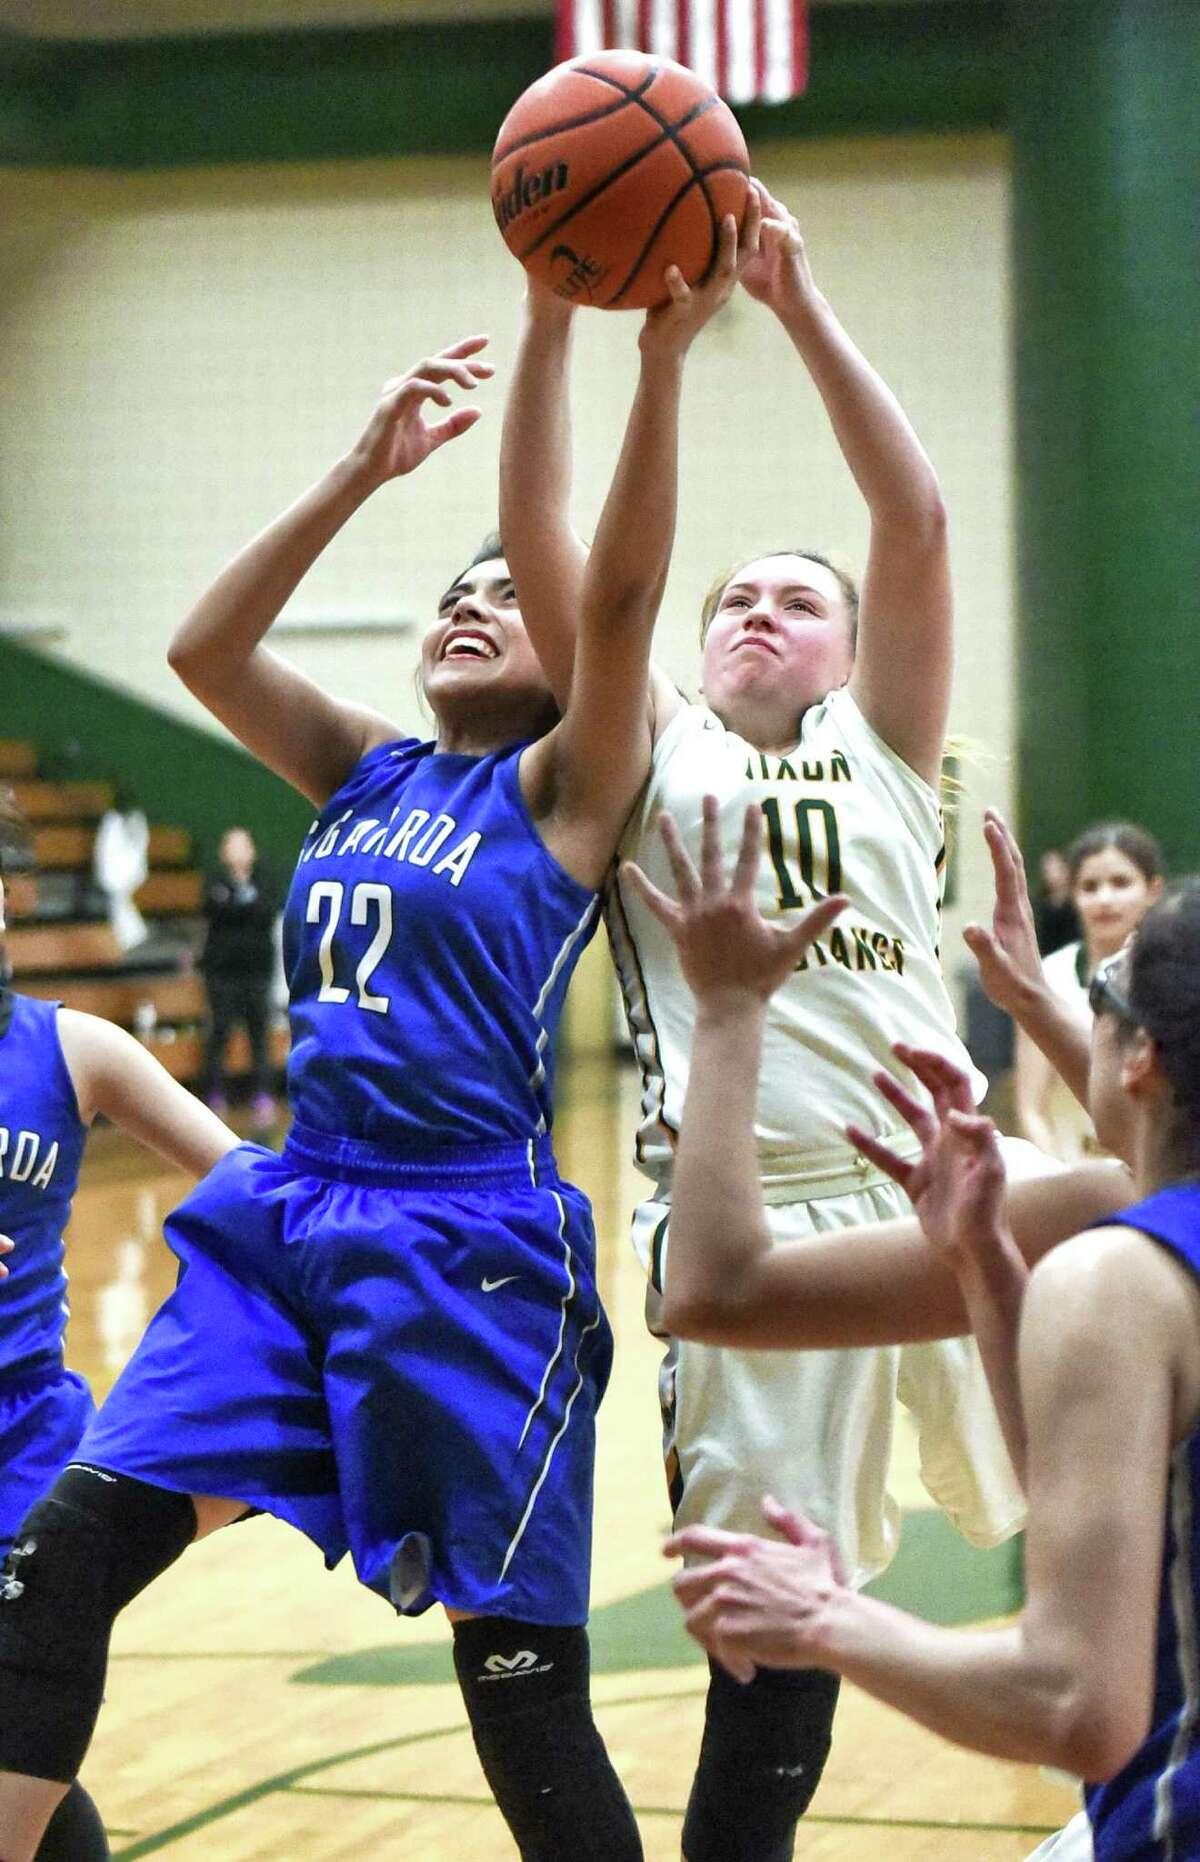 Cigarroa High School Larissa Palomares and Nixon High School Alejandra Gutierrez fight for the rebound on Friday night during a game at Nixon High School.